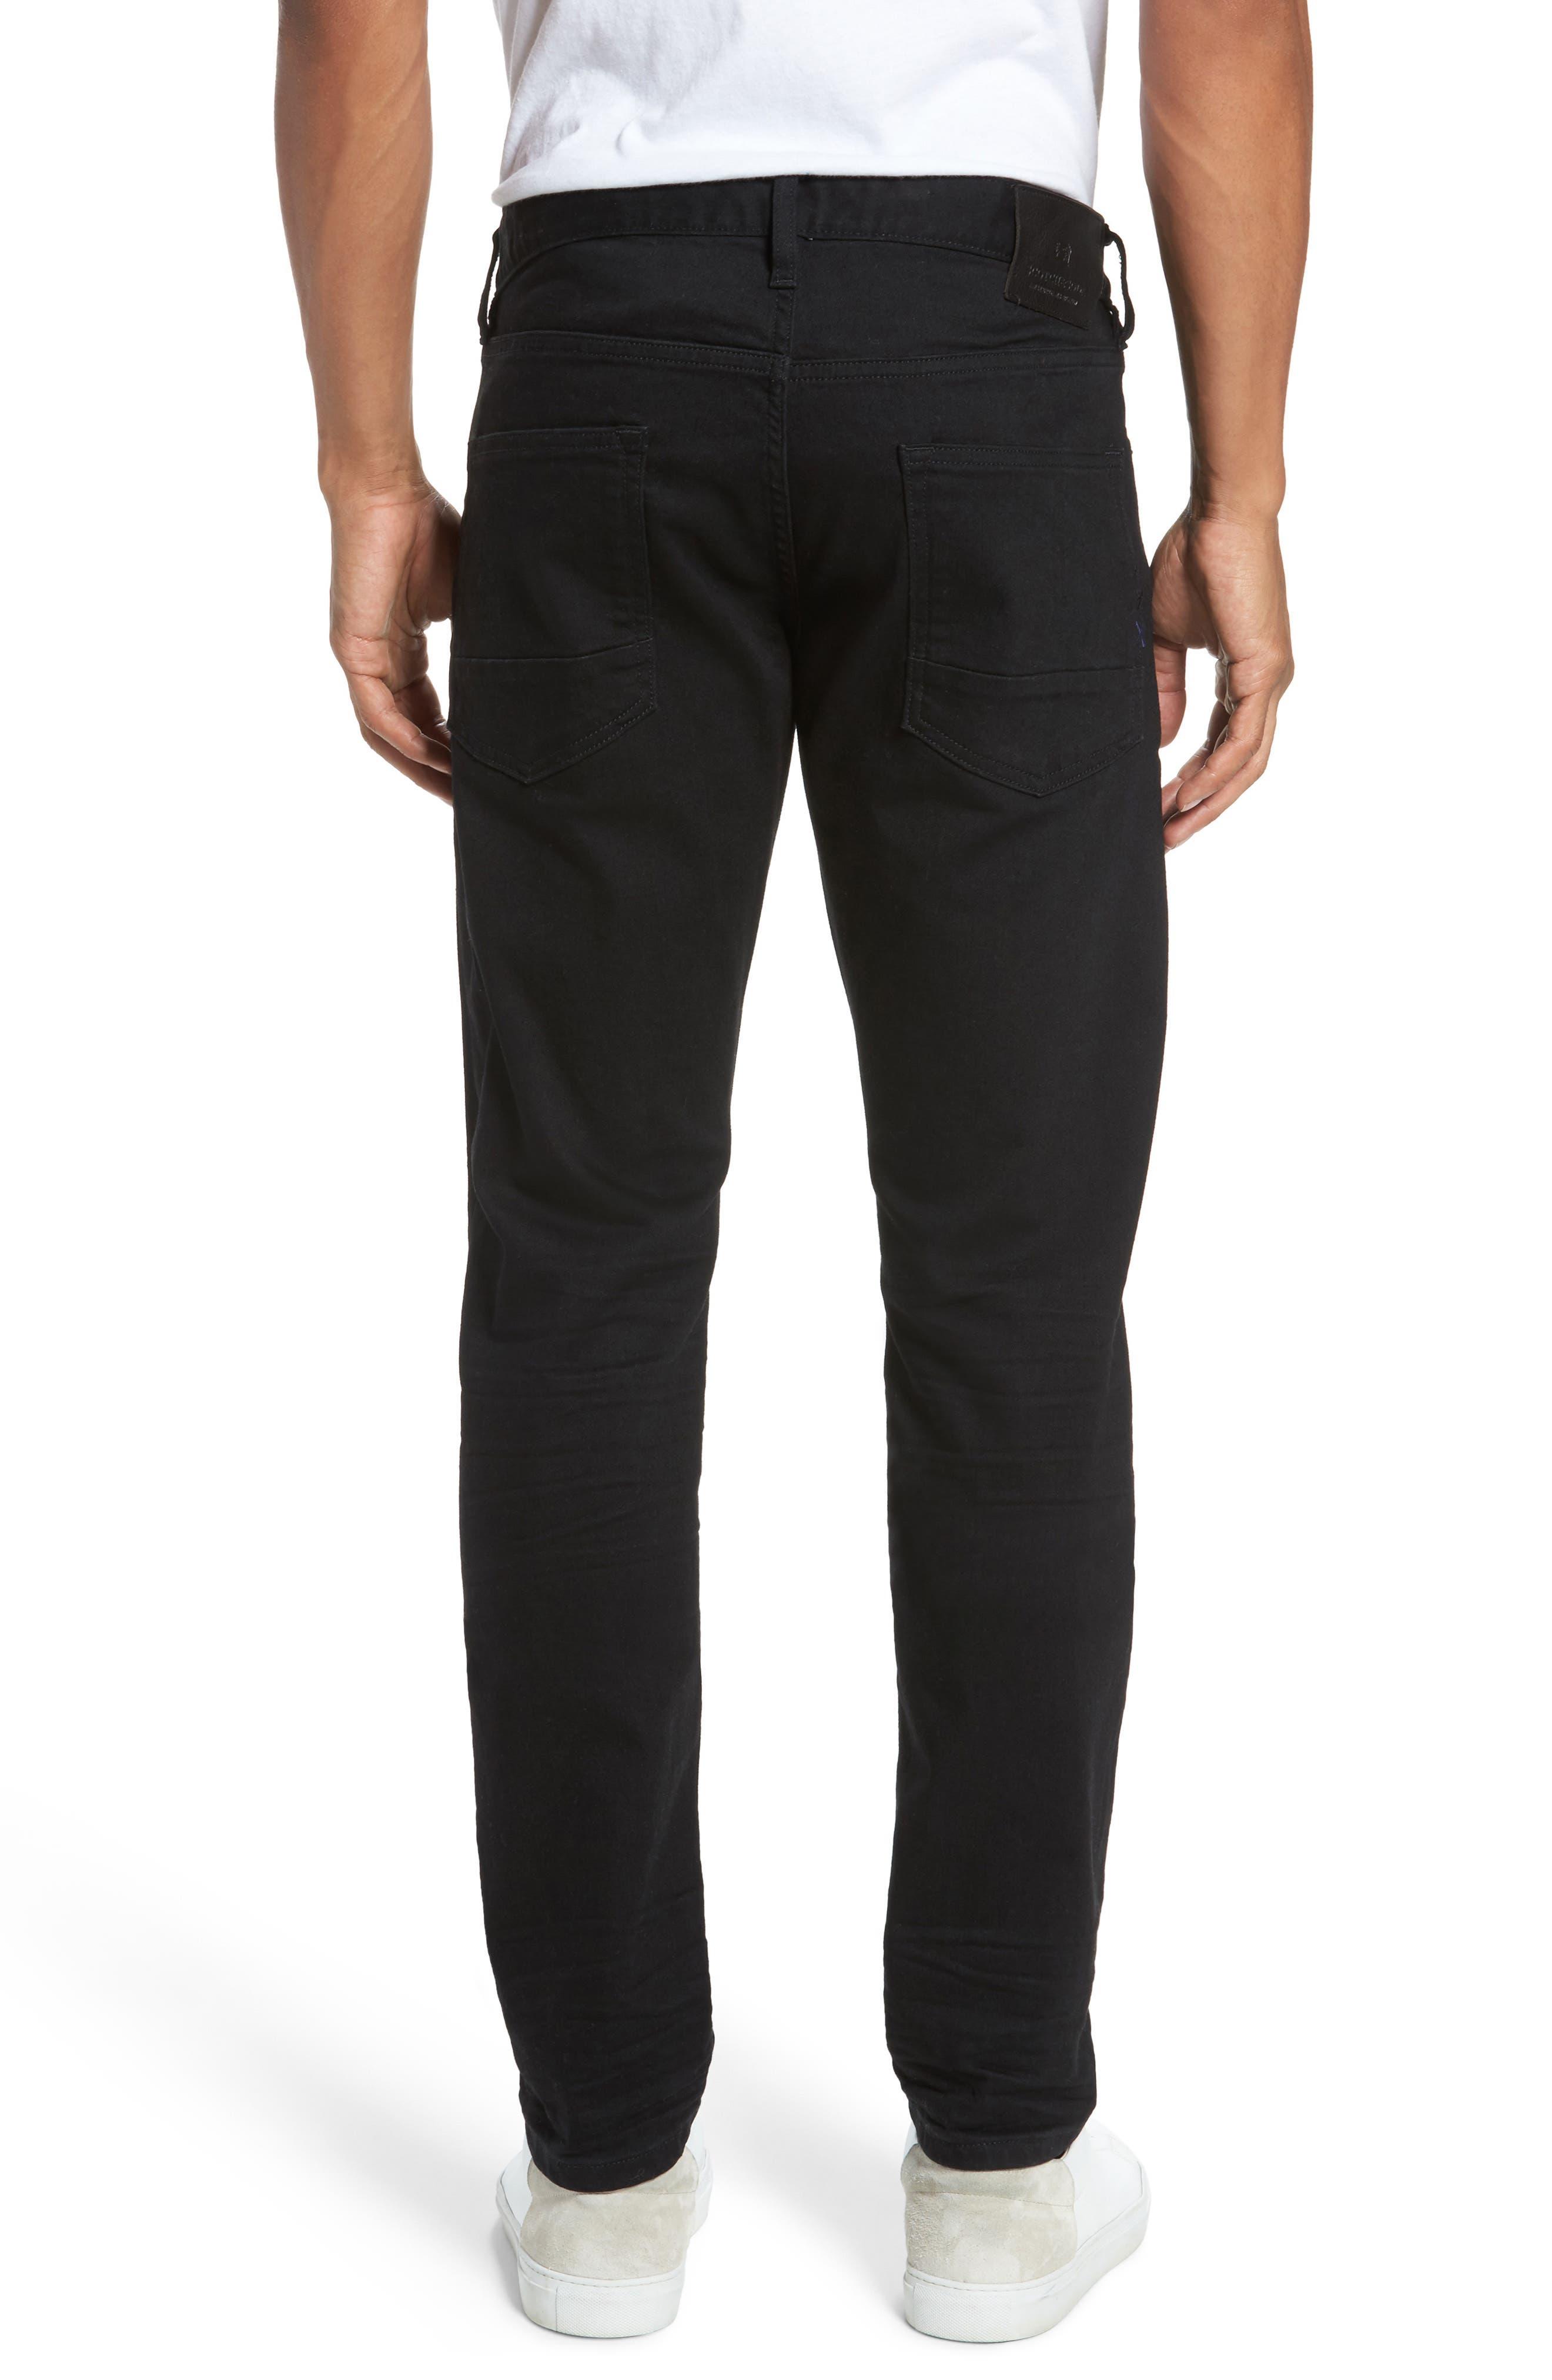 Alternate Image 2  - Scotch & Soda Ralston Slim Straight Leg Jeans (Stay Black)